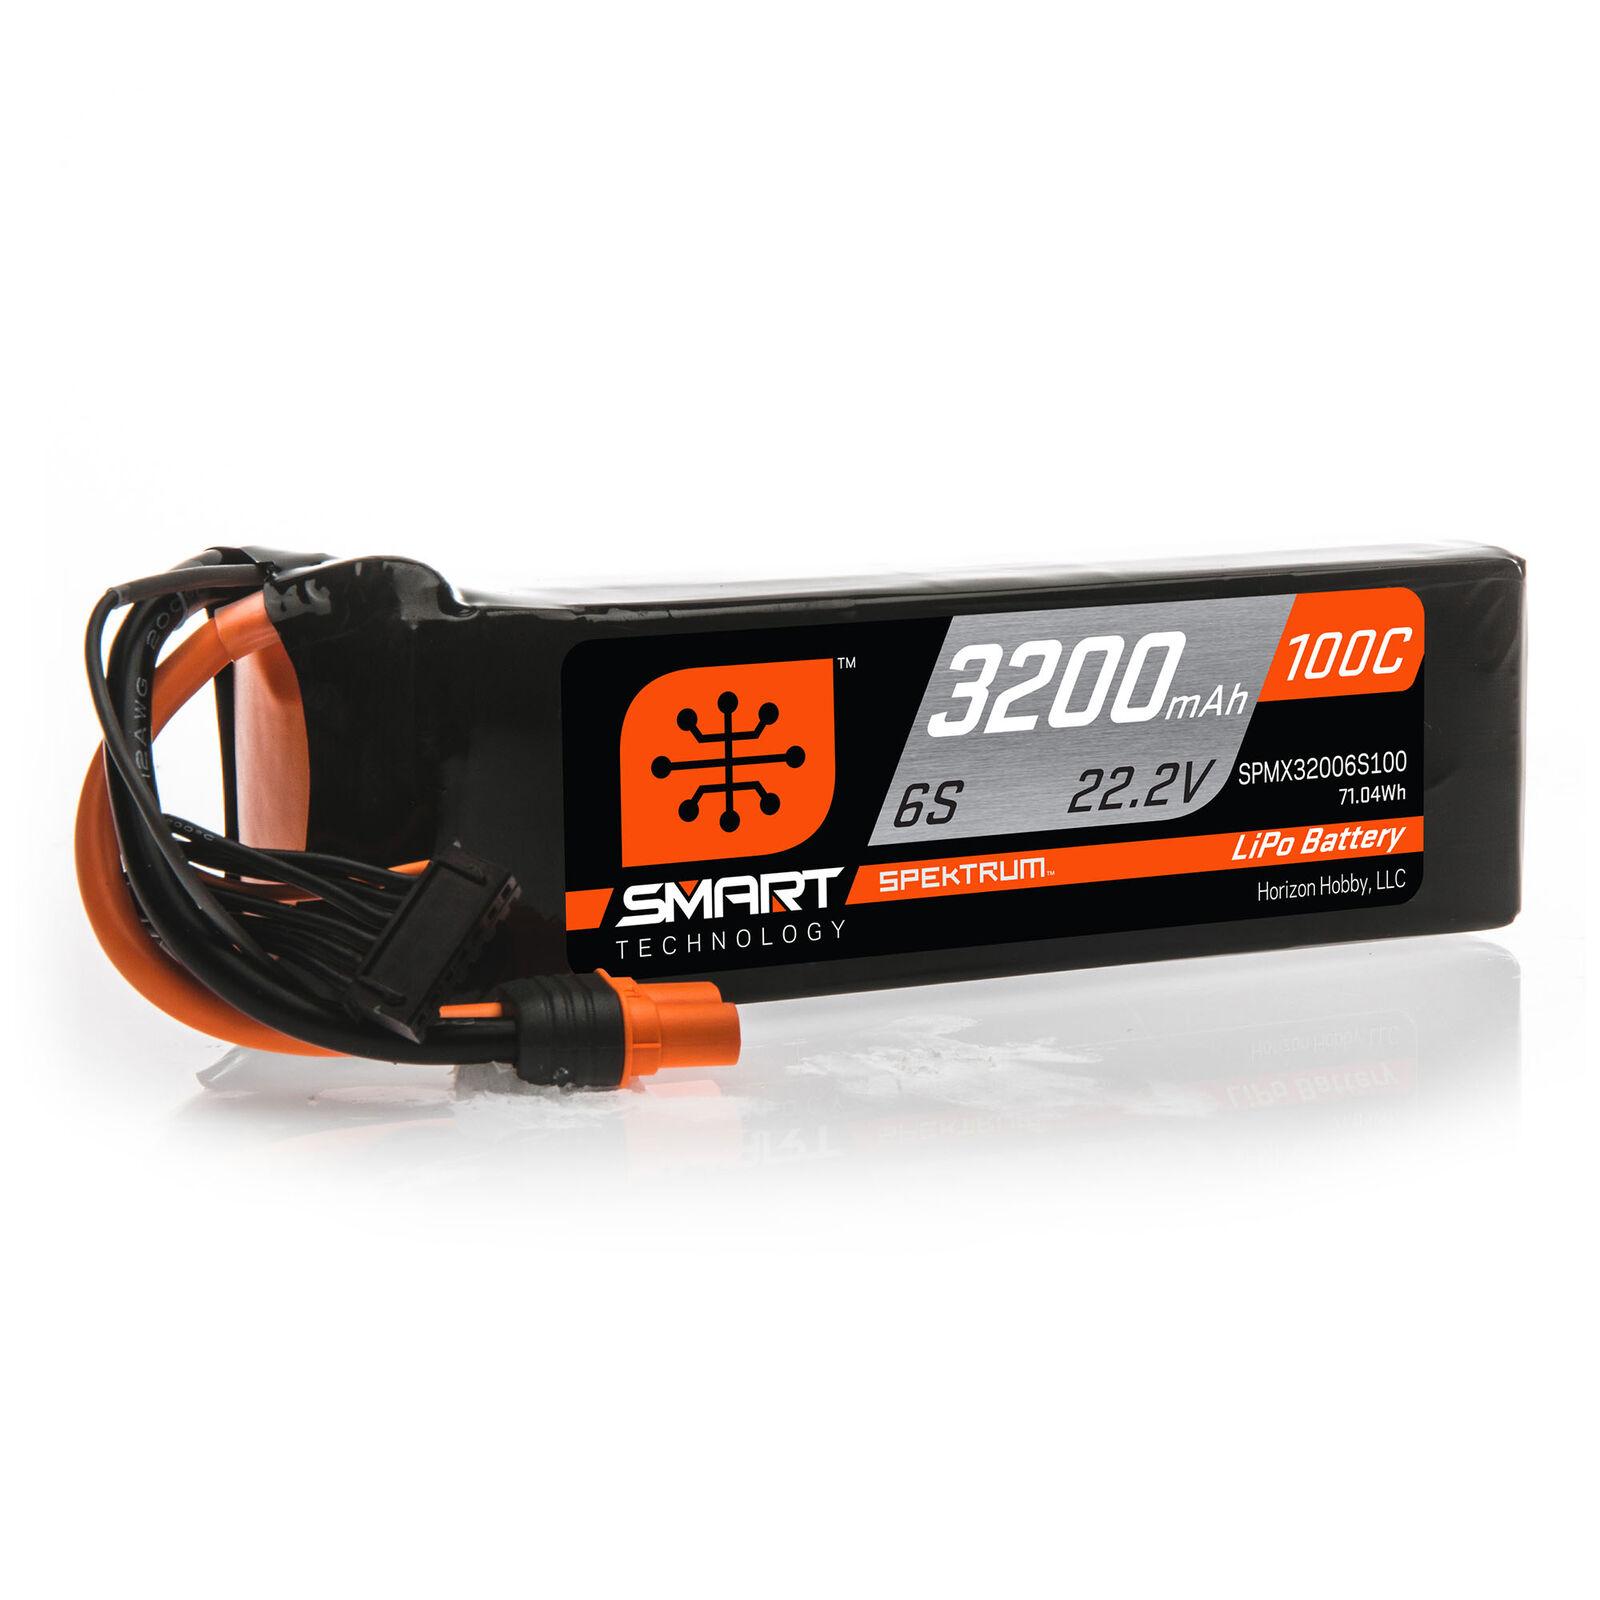 22.2V 3200mAh 6S 100C Smart LiPo Battery: IC5